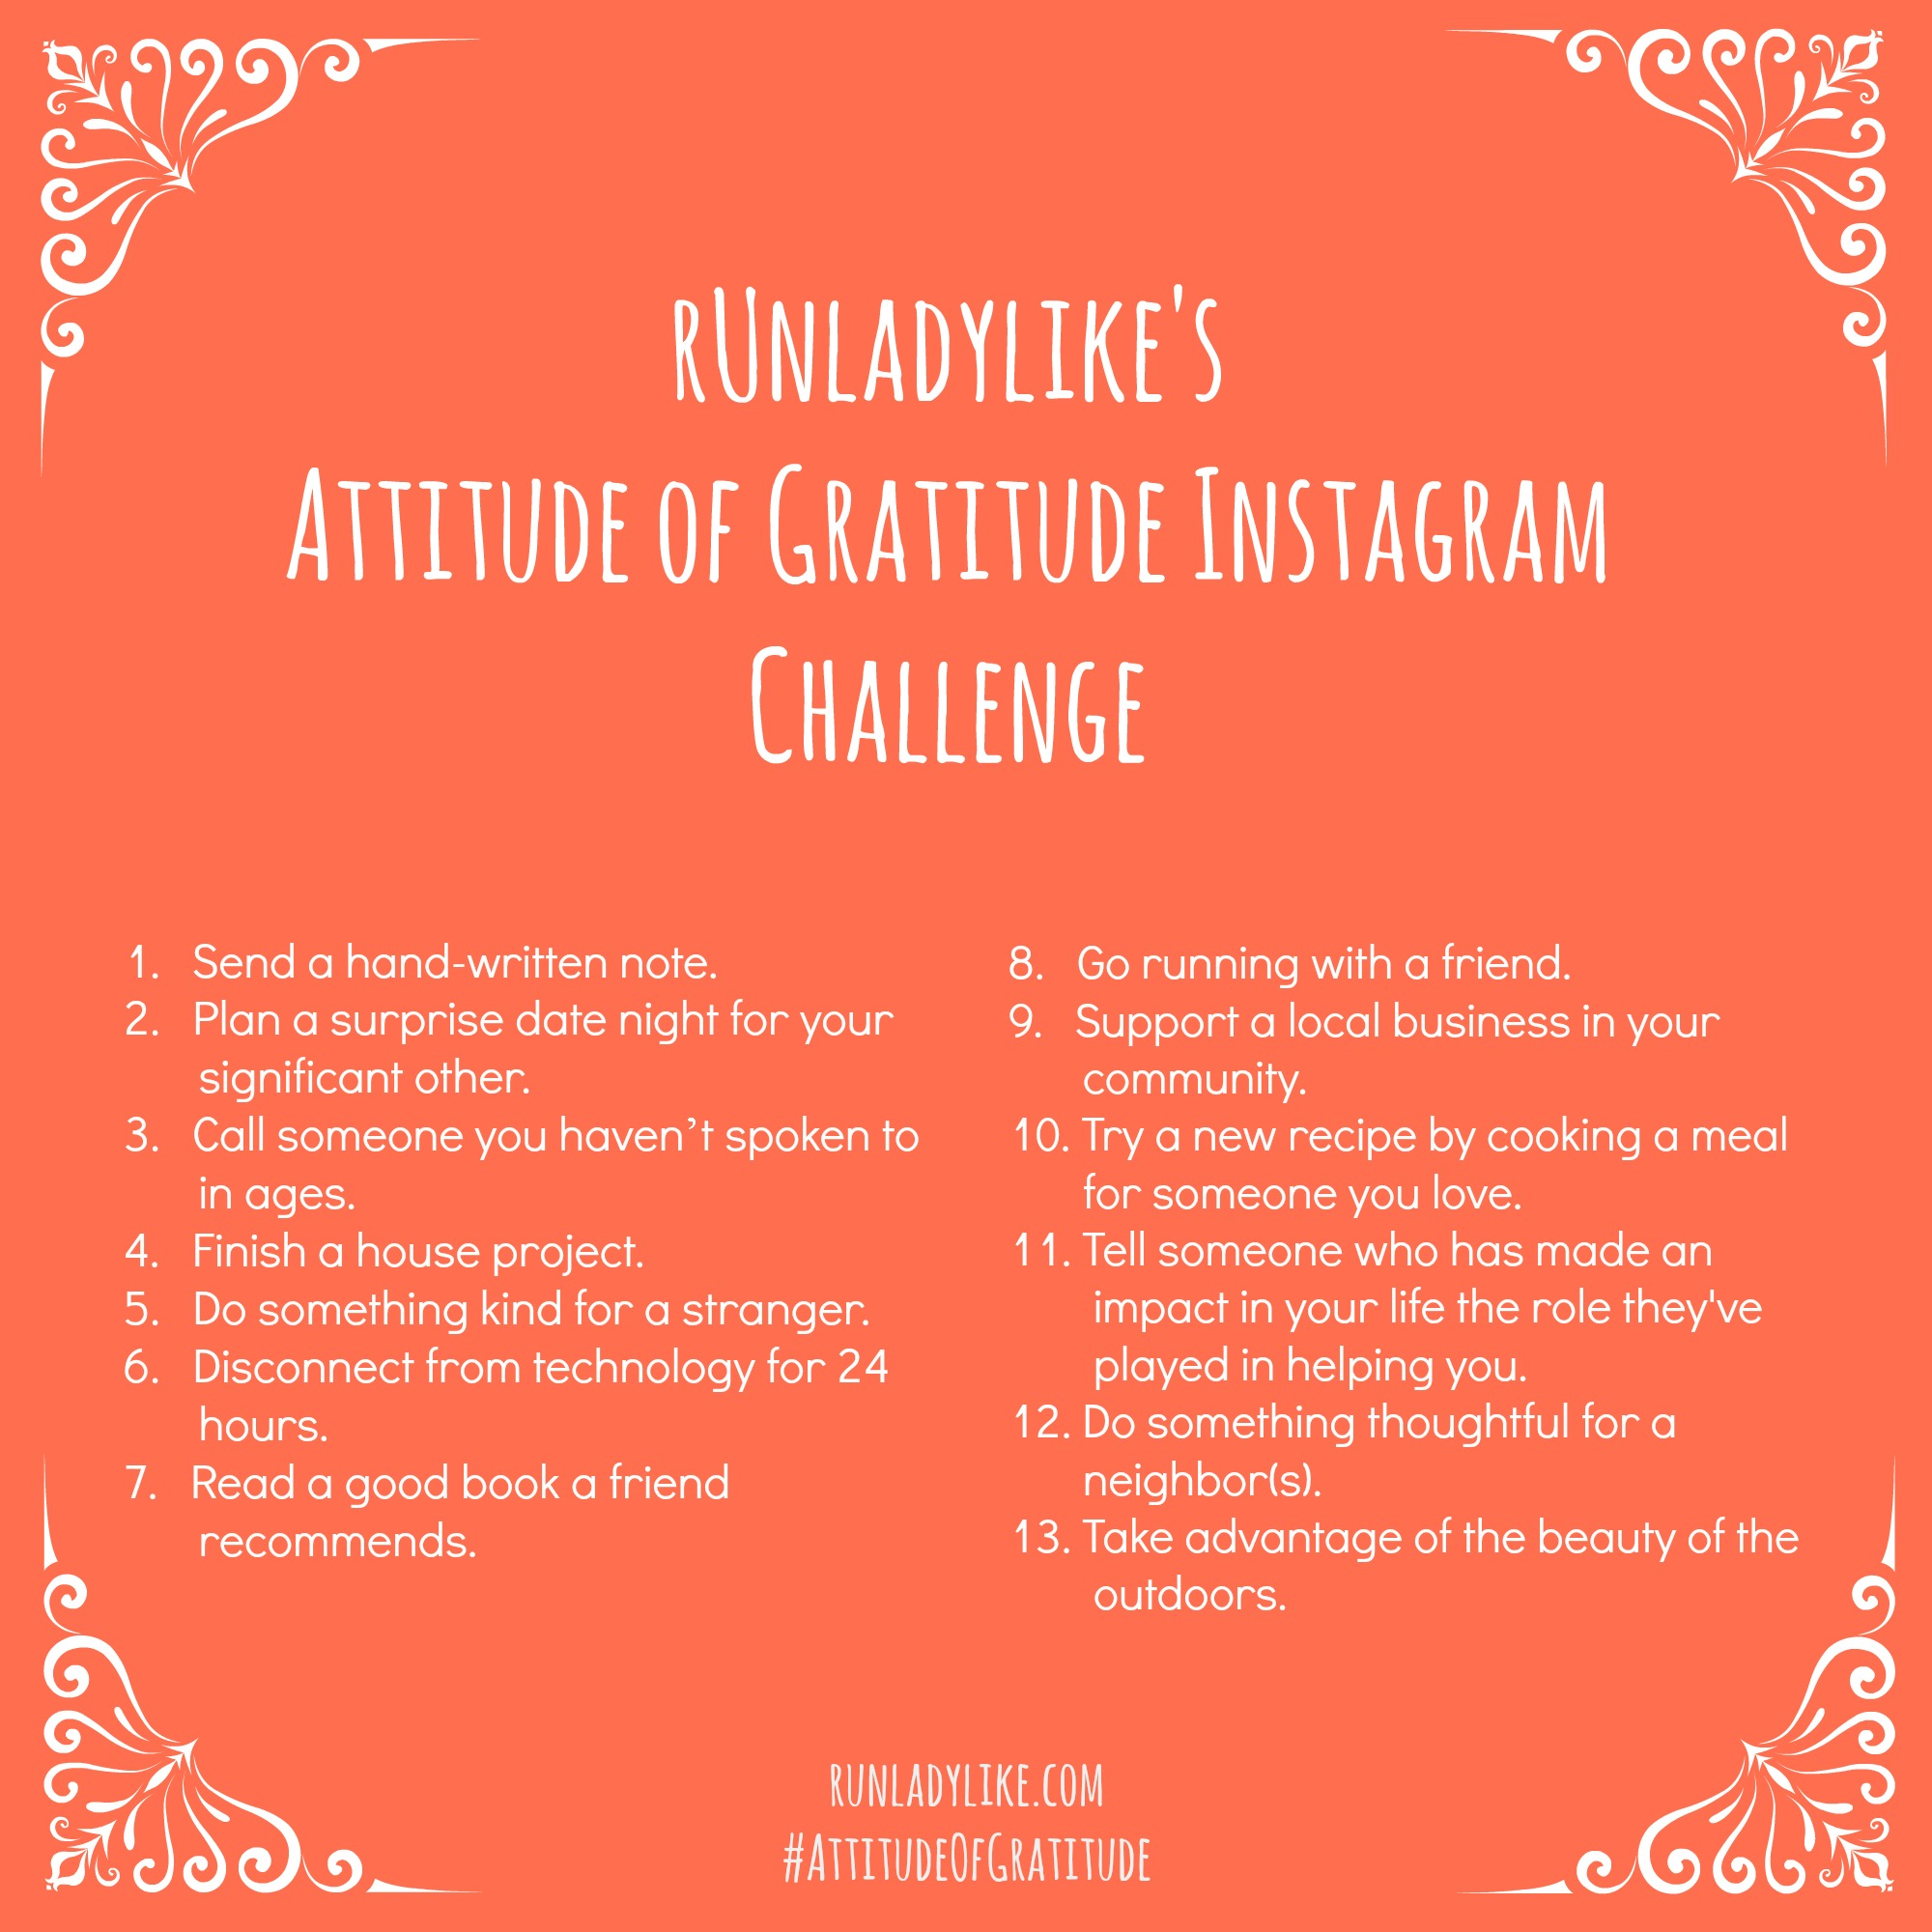 Attitude Of Gratitude Instagram Challenge 13 Things To Do